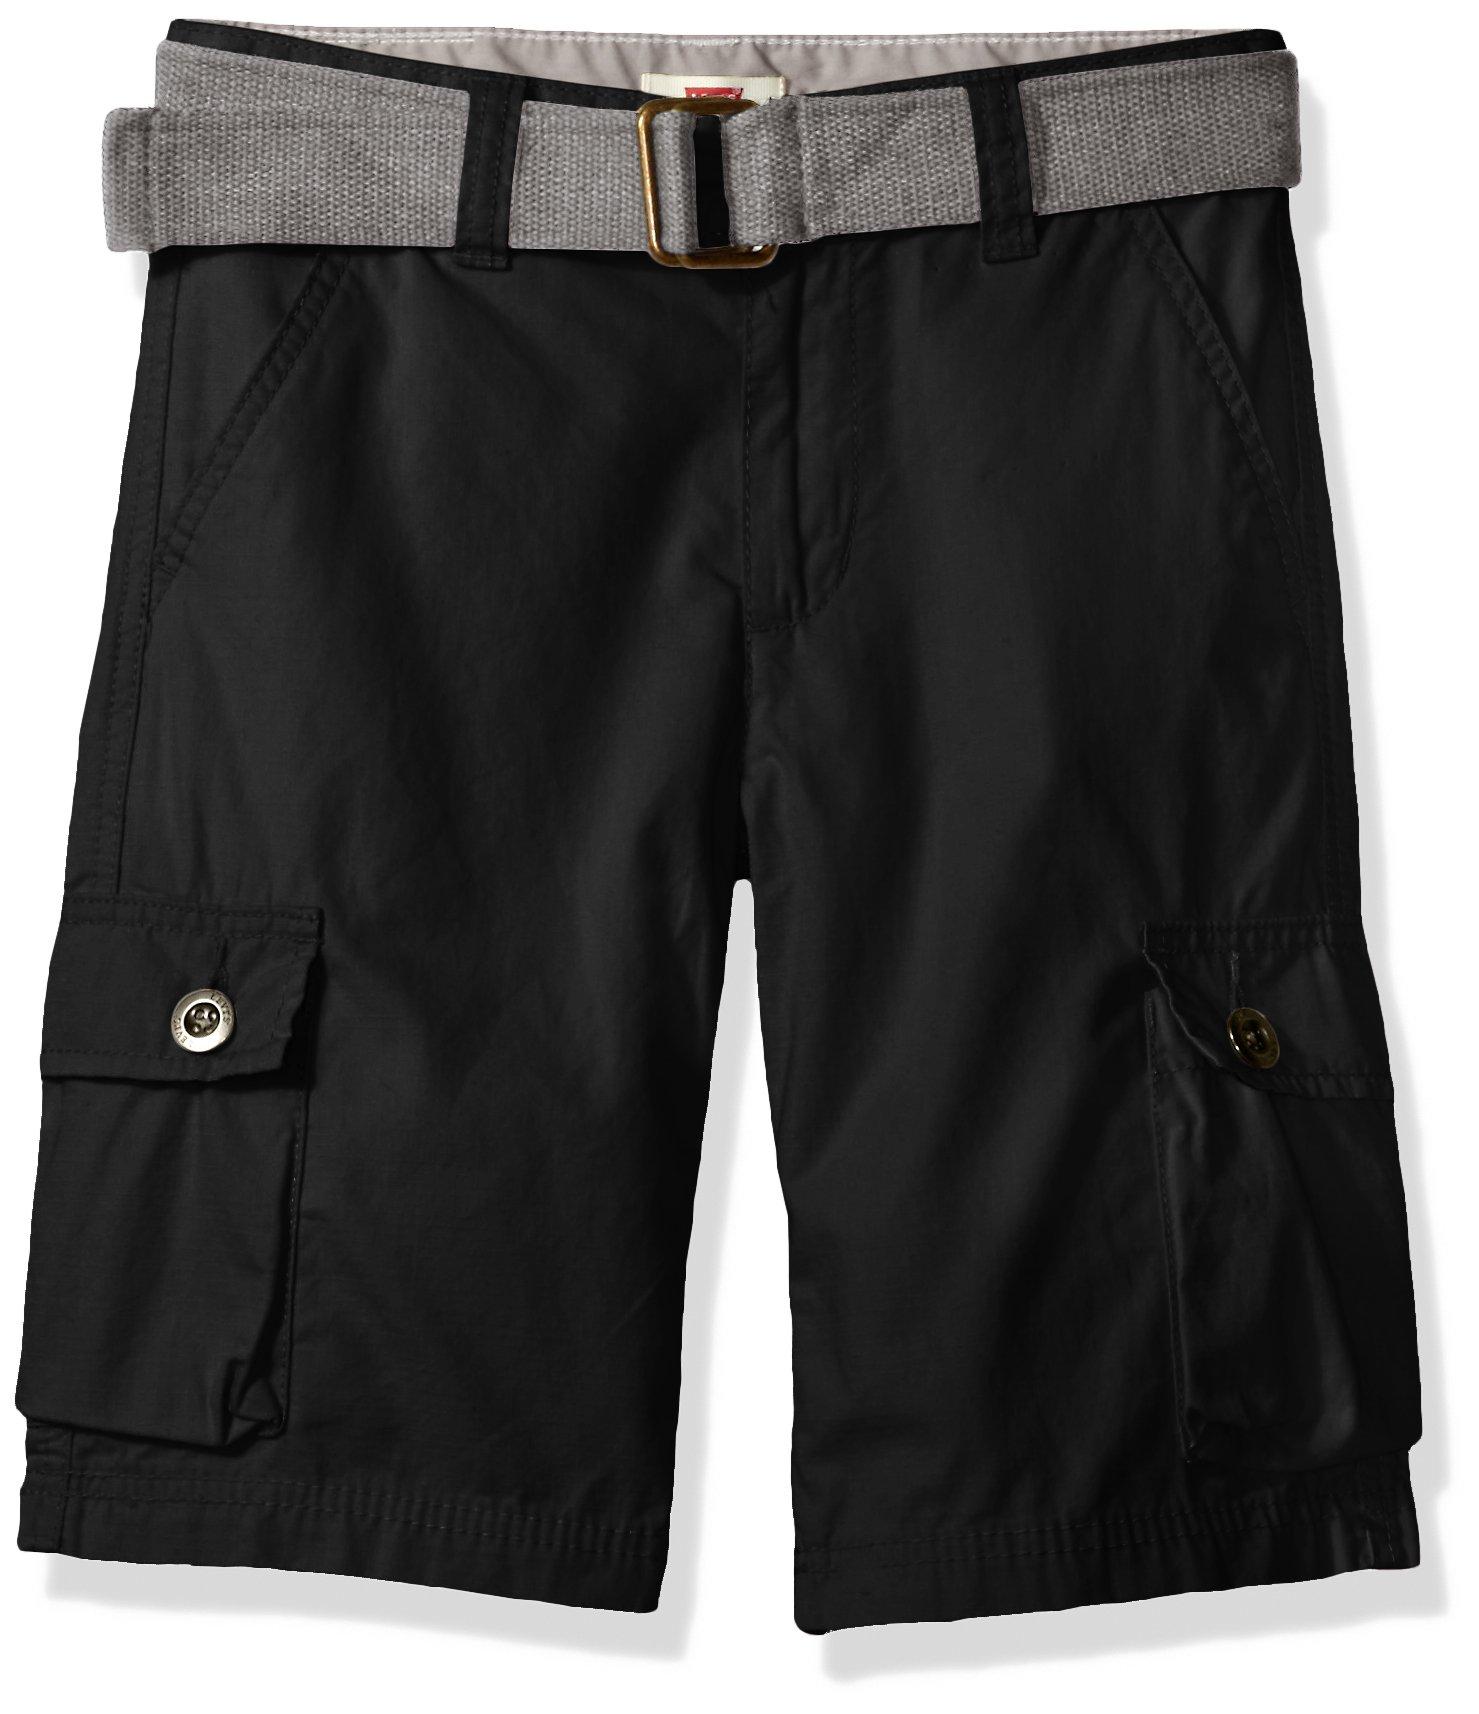 Levi's Big Boys' Cargo Shorts, Black, 14 by Levi's